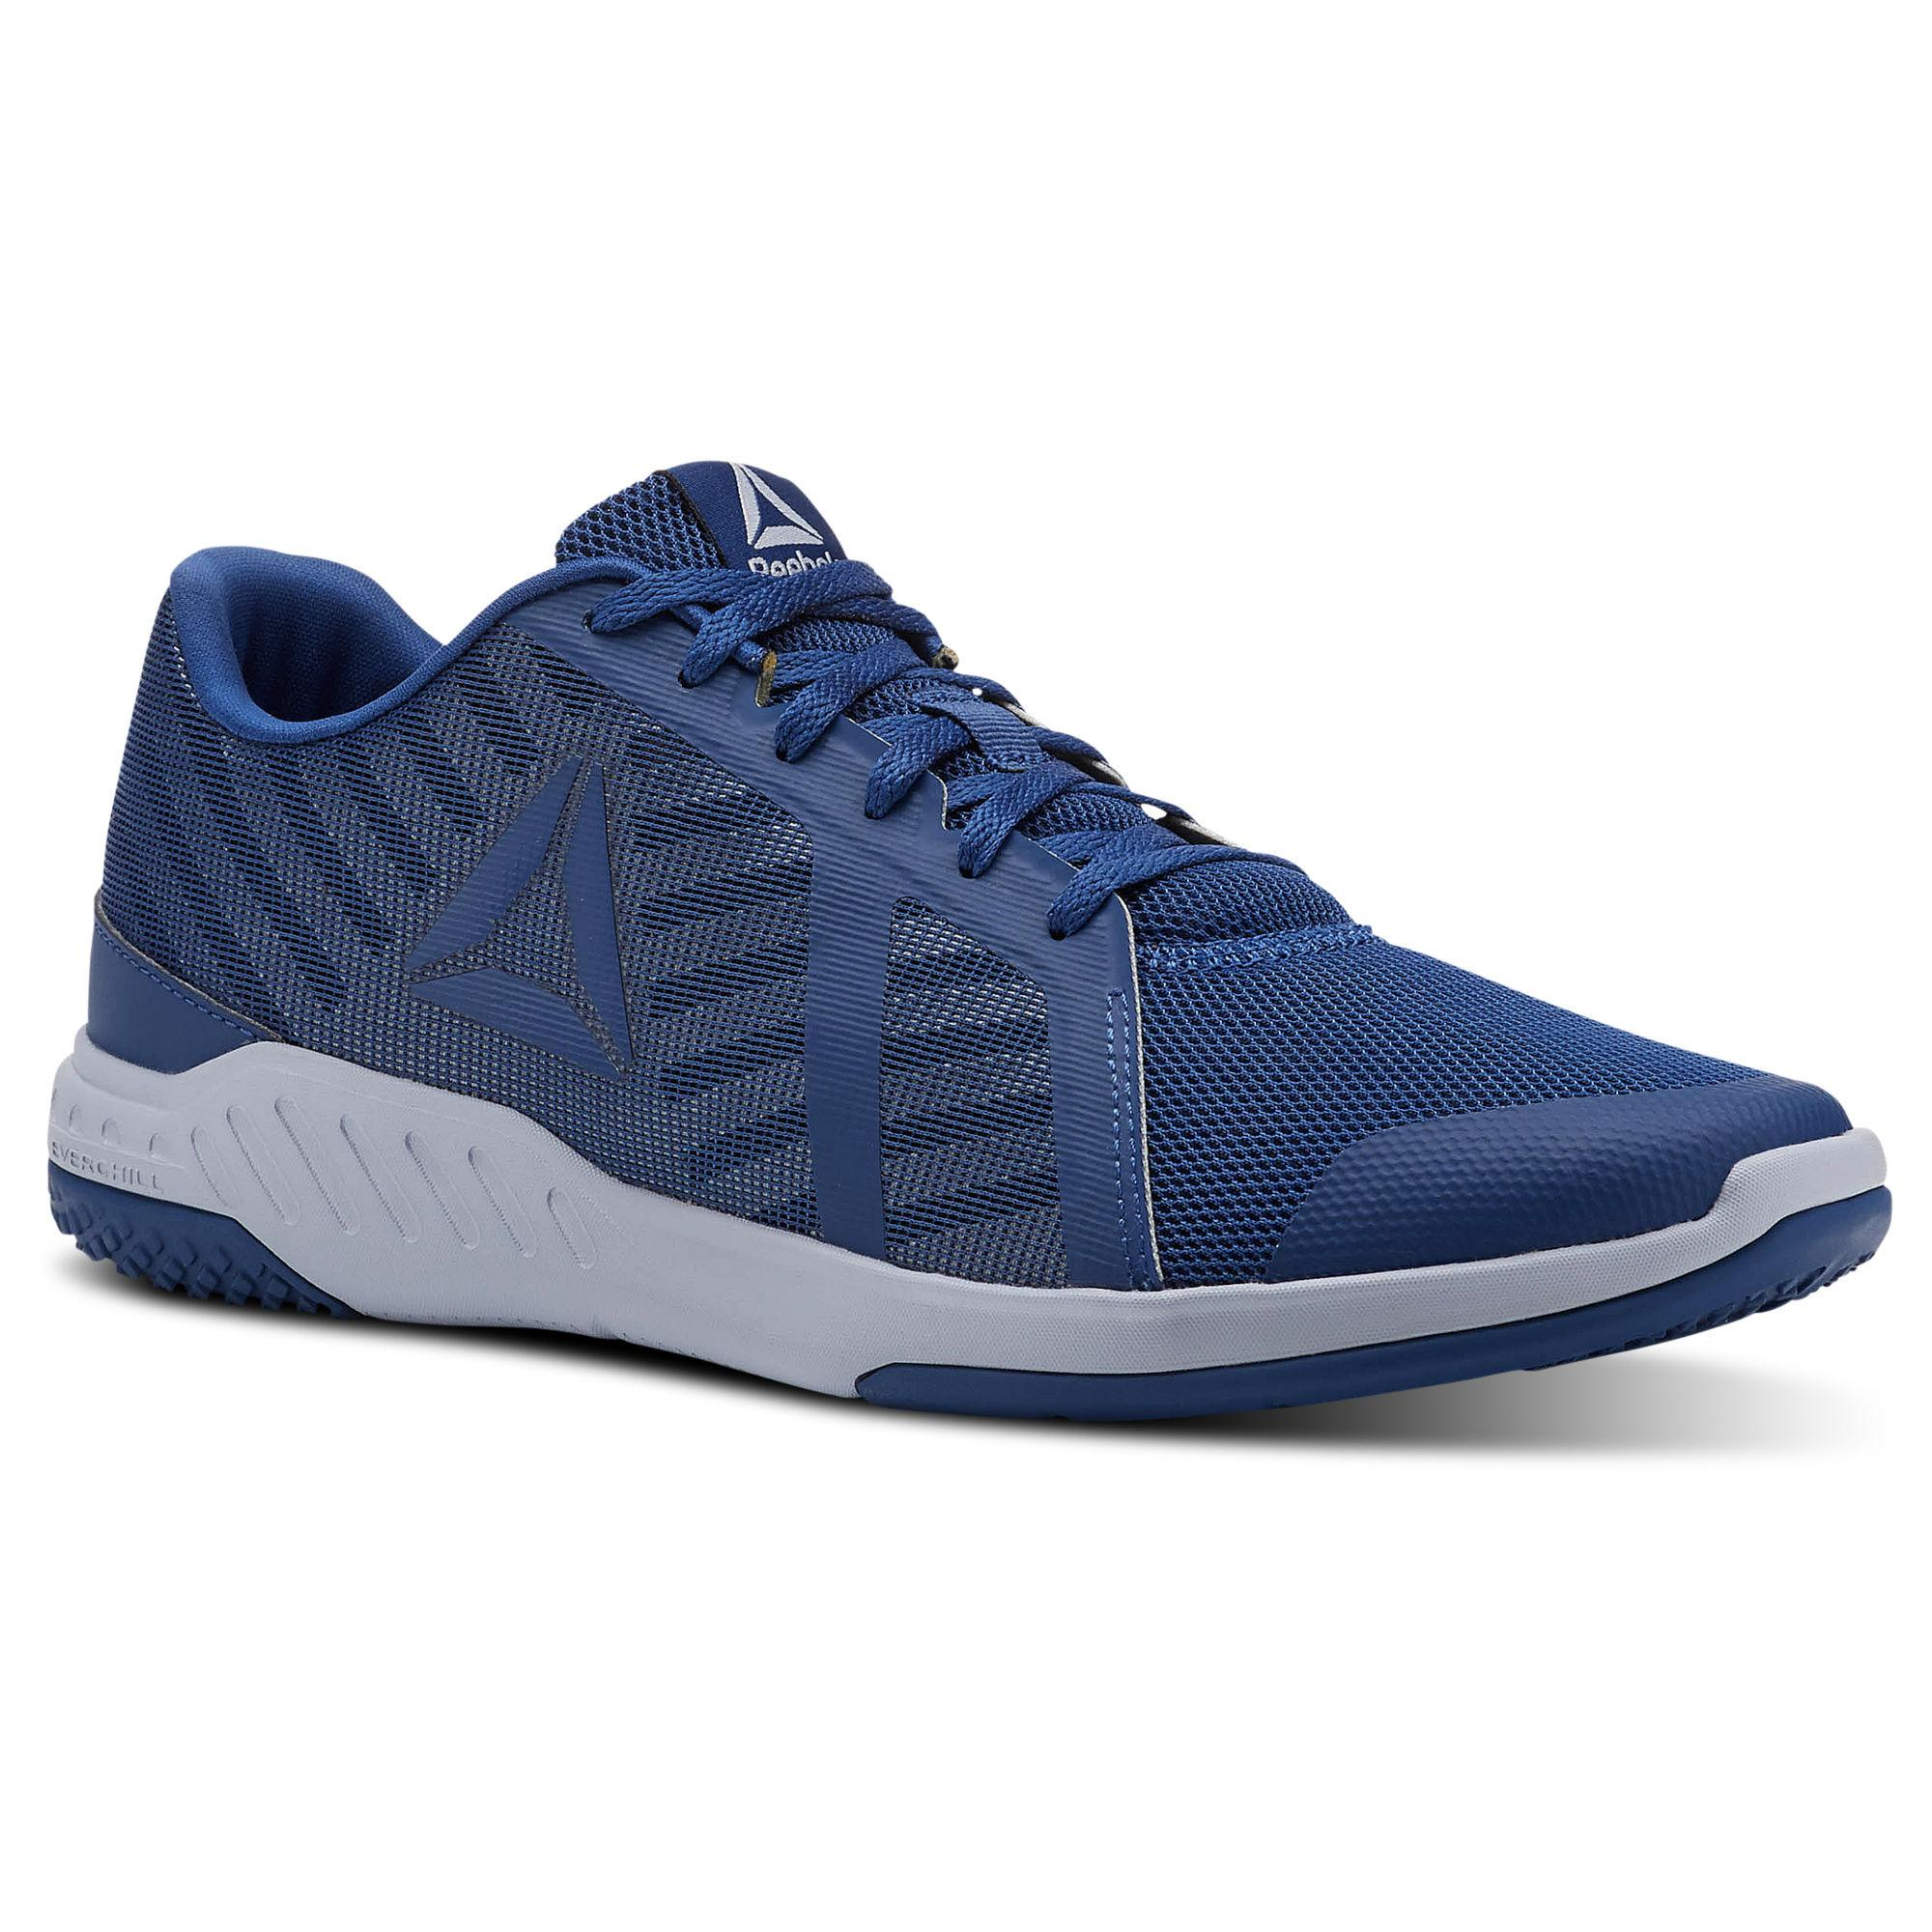 14de2067df8 Sepatu Reebok Everchill TR 2.0 Sports Training - Blue